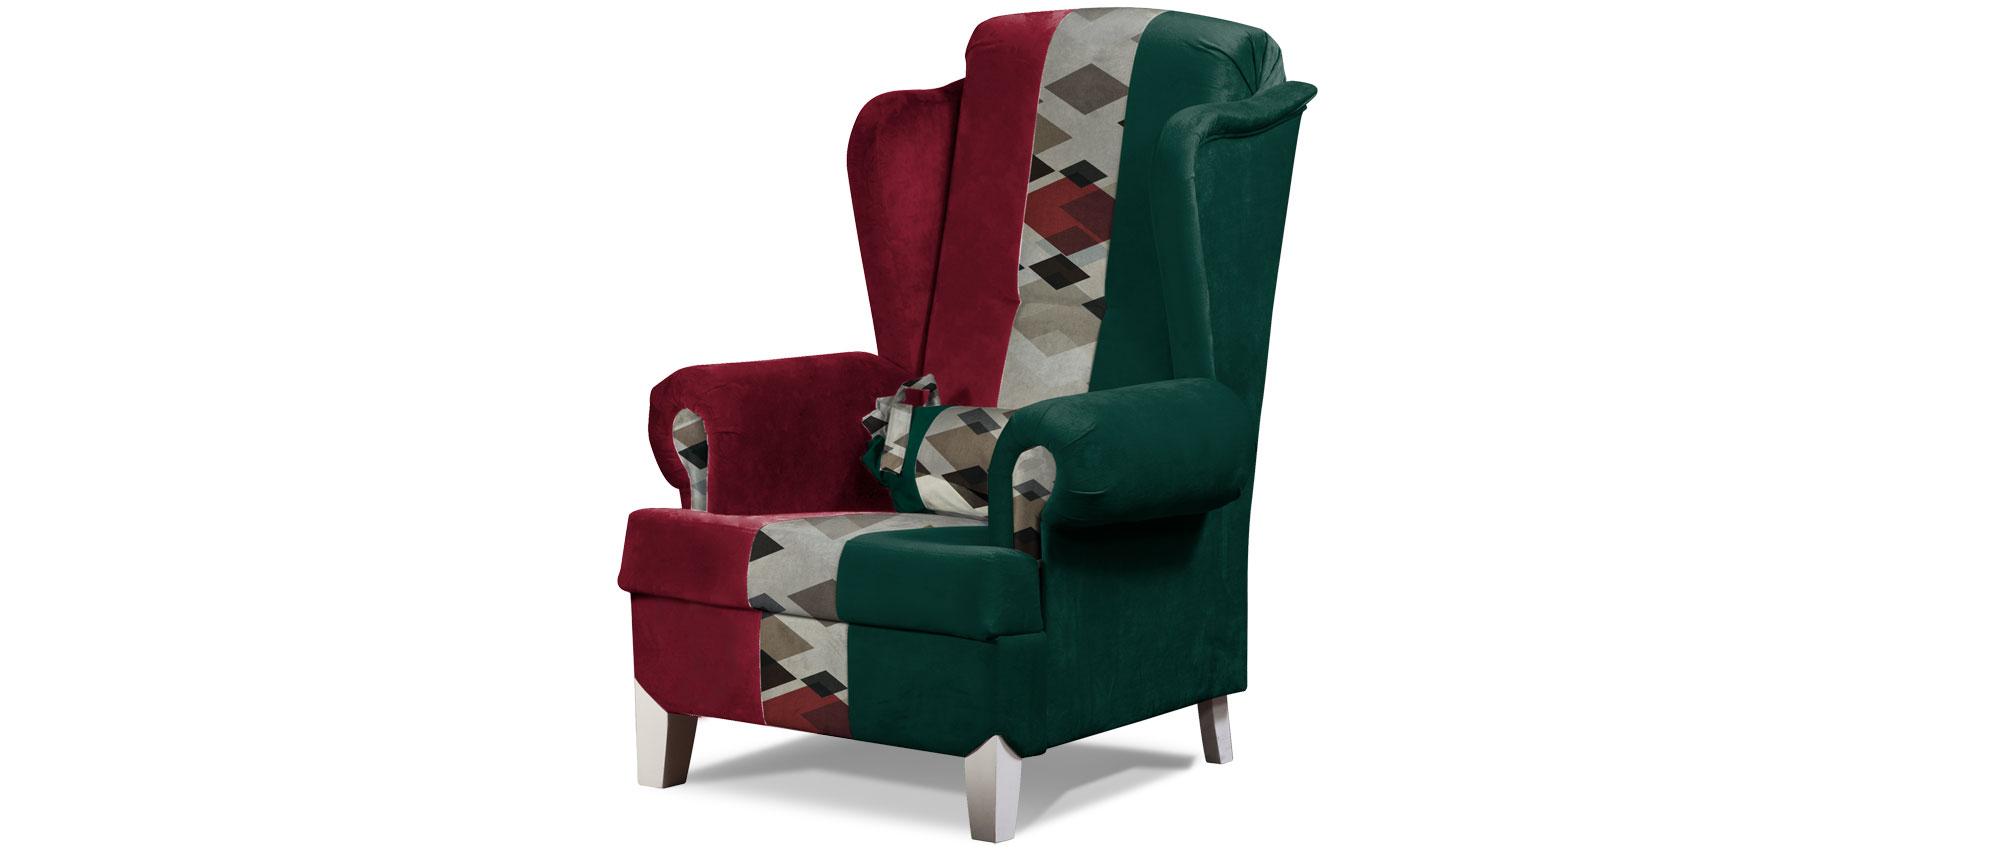 Fotelja Lara